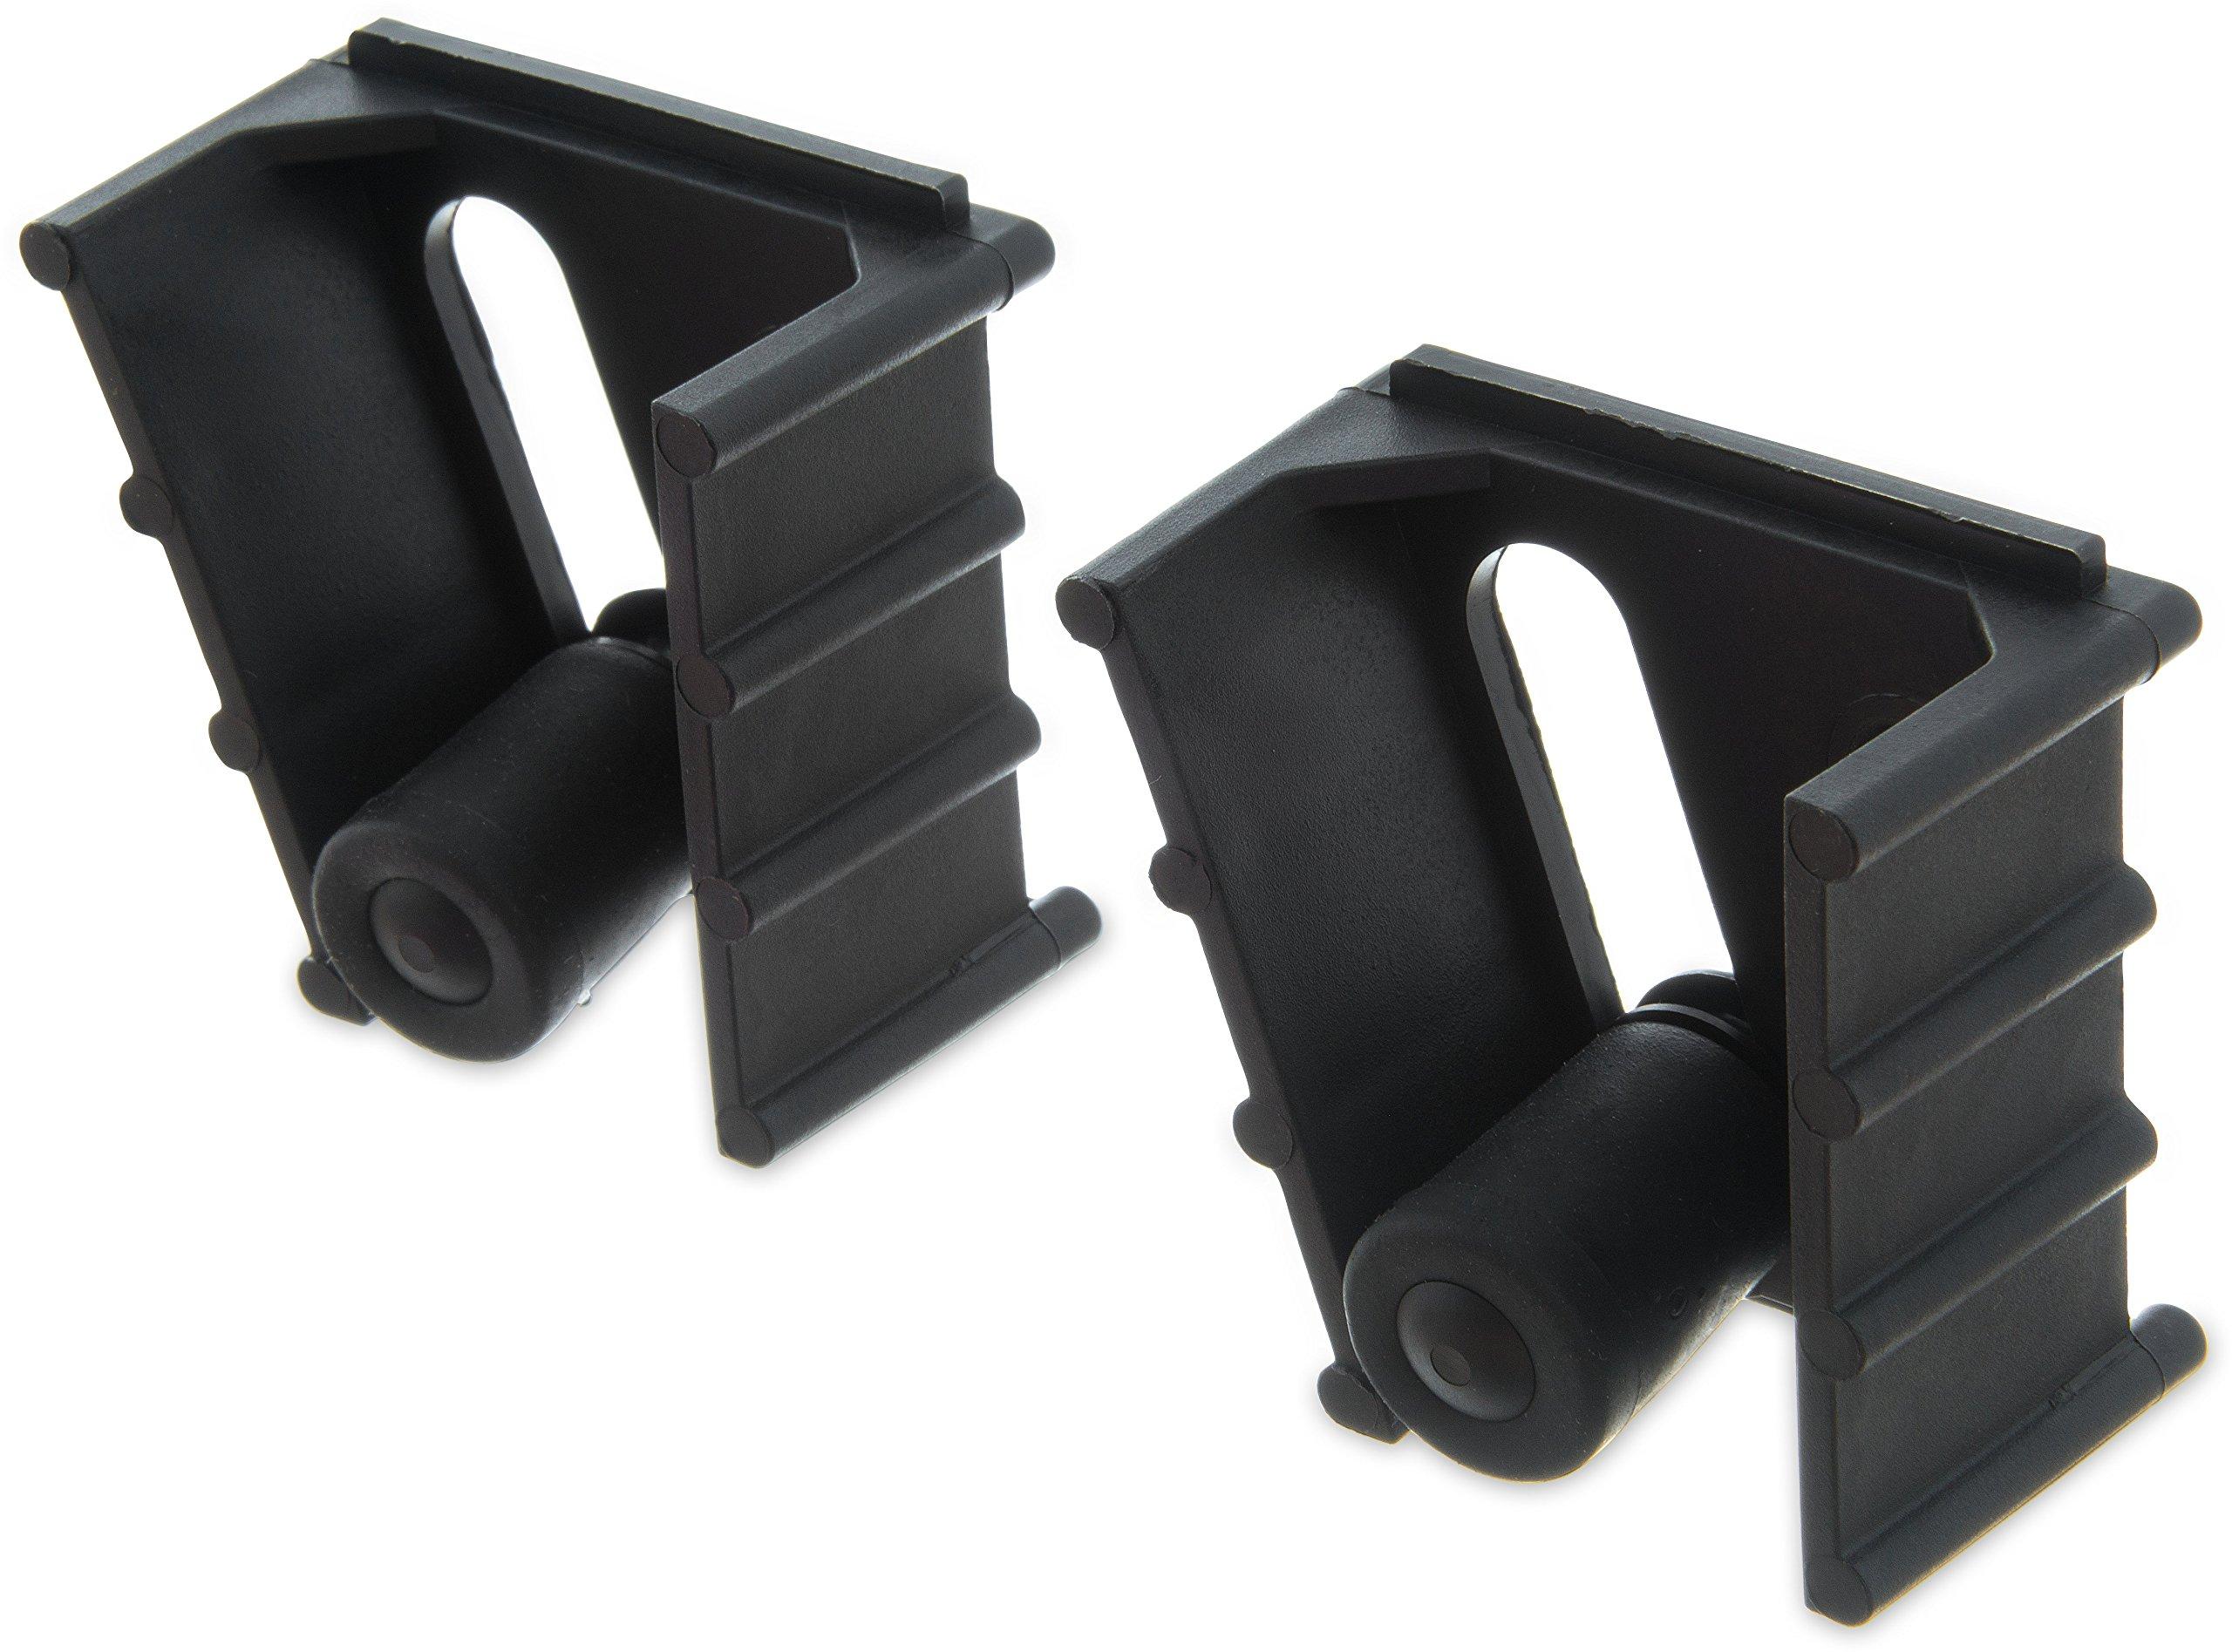 Carlisle 4073200 Roll 'N Grip Plastic Holder with Wood Screws, 2-1/2'' L x 3-3/4'' W x 1/2'' H (Case of 12)